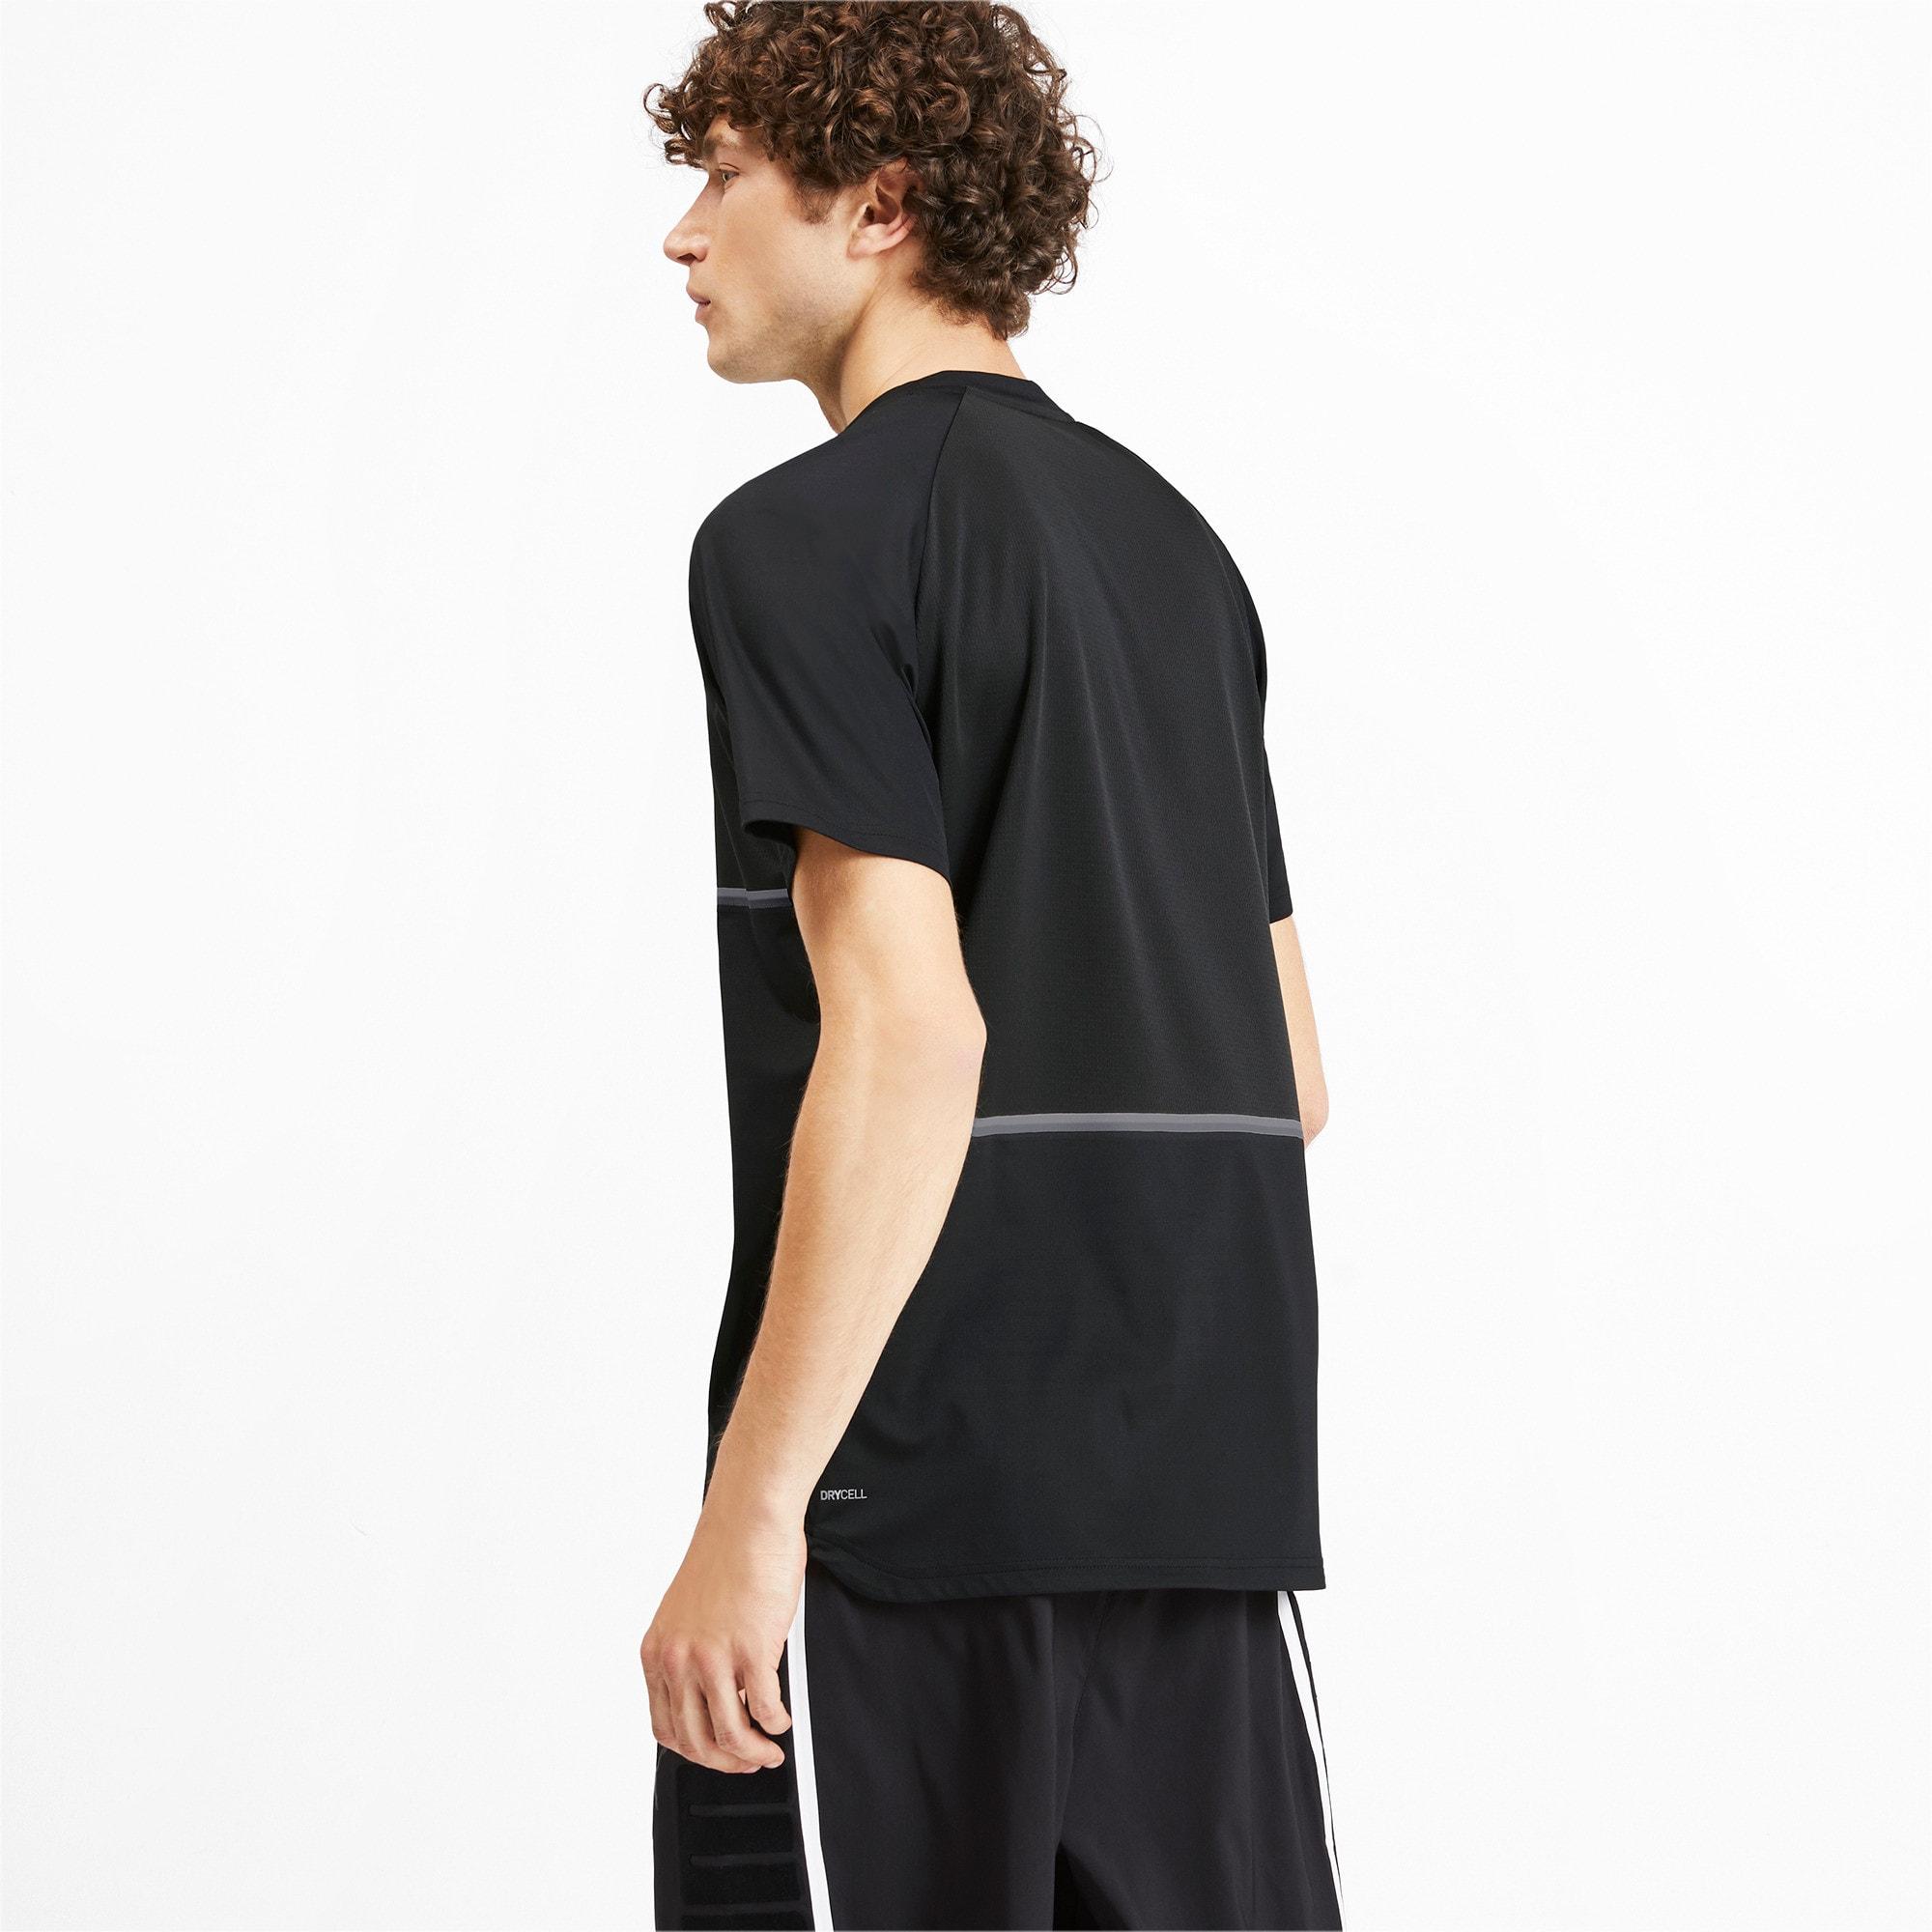 Thumbnail 2 of Power BND T-shirt voor heren, Puma Black, medium